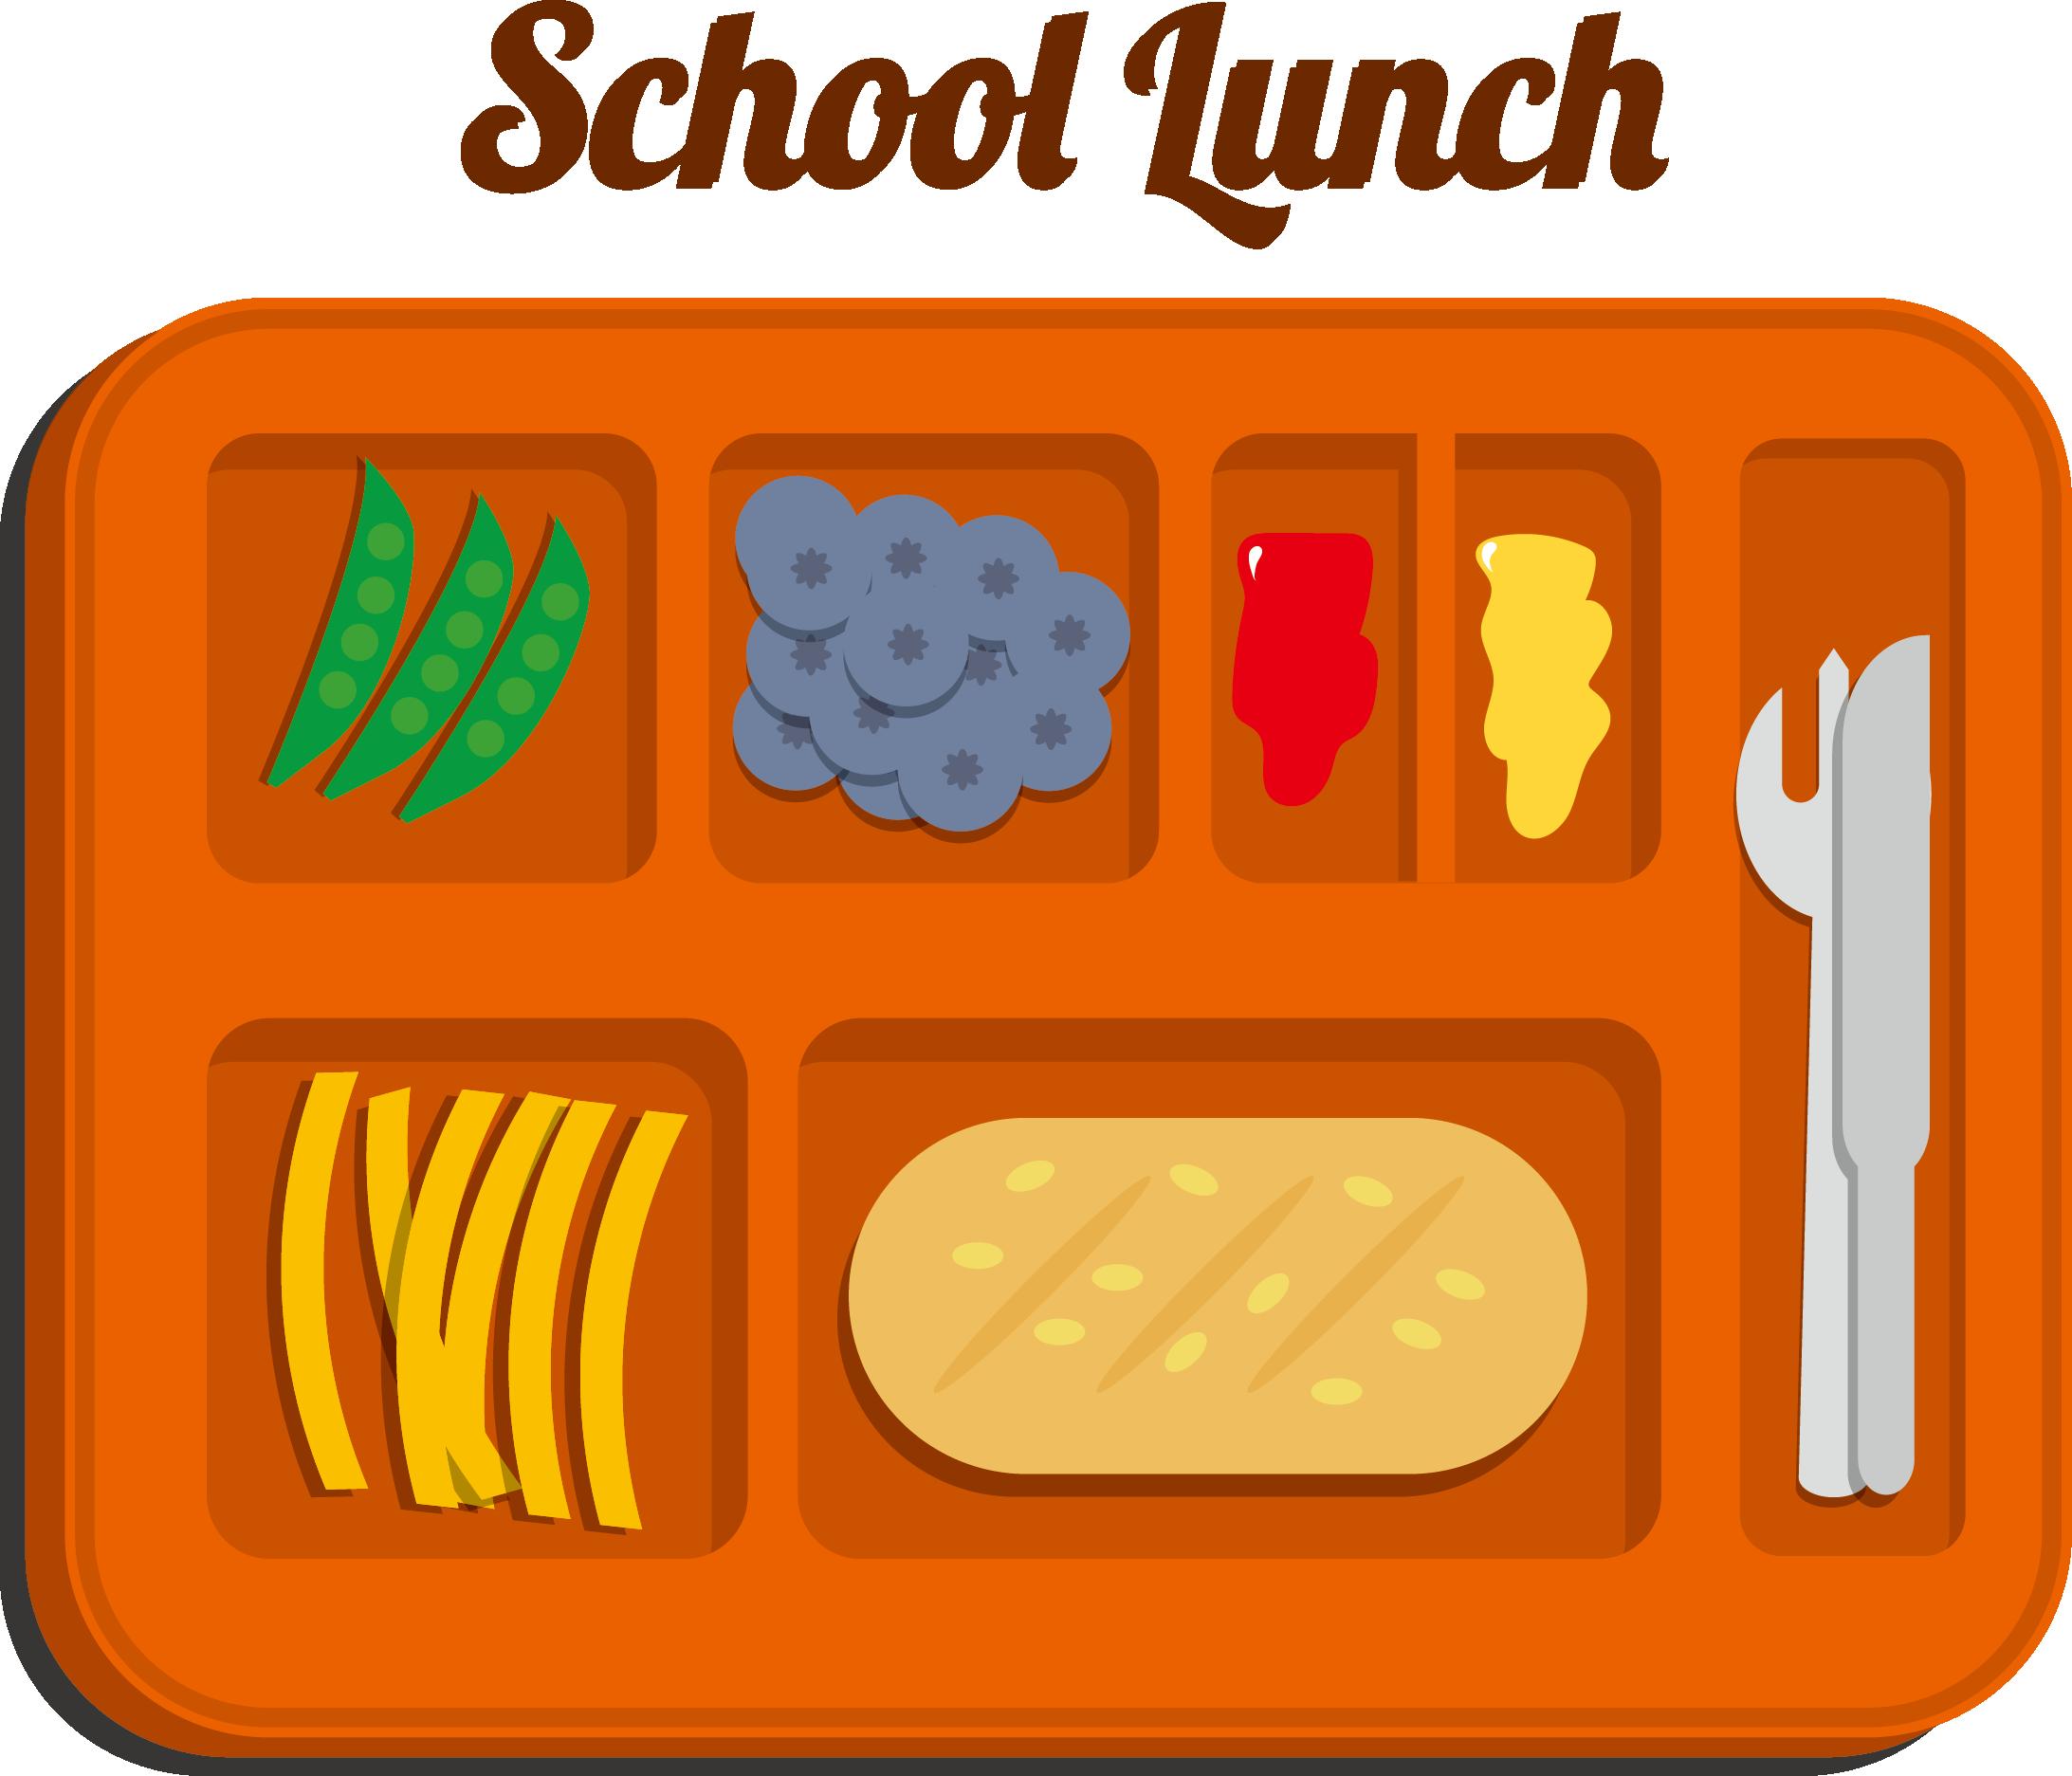 Luncheon clipart parent. Parents school meal information